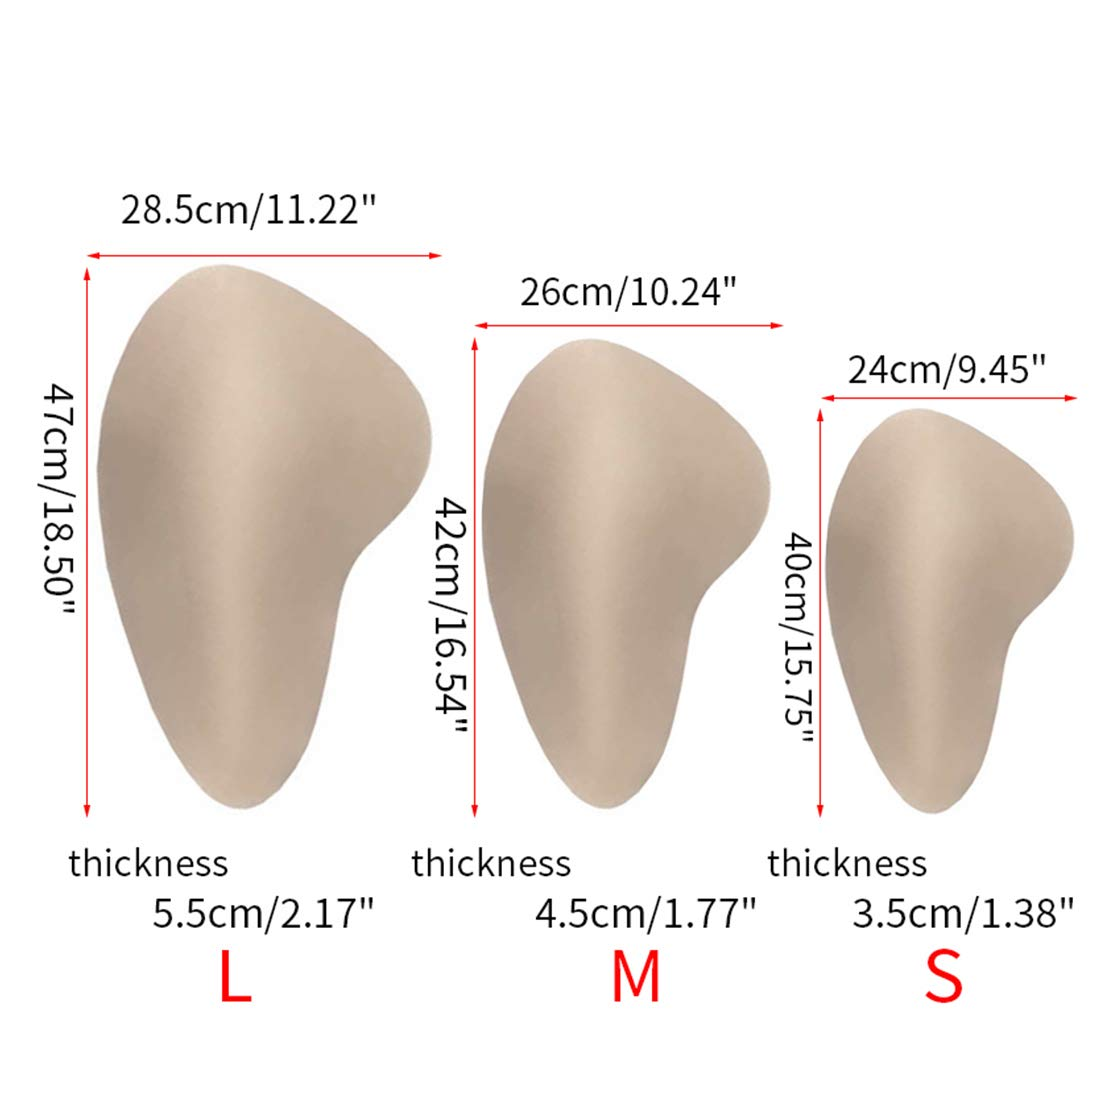 YUENA CARE Hip Pads Sponge Hip Enhancer Butt Lifter Shaper Reusable for Crossdressing